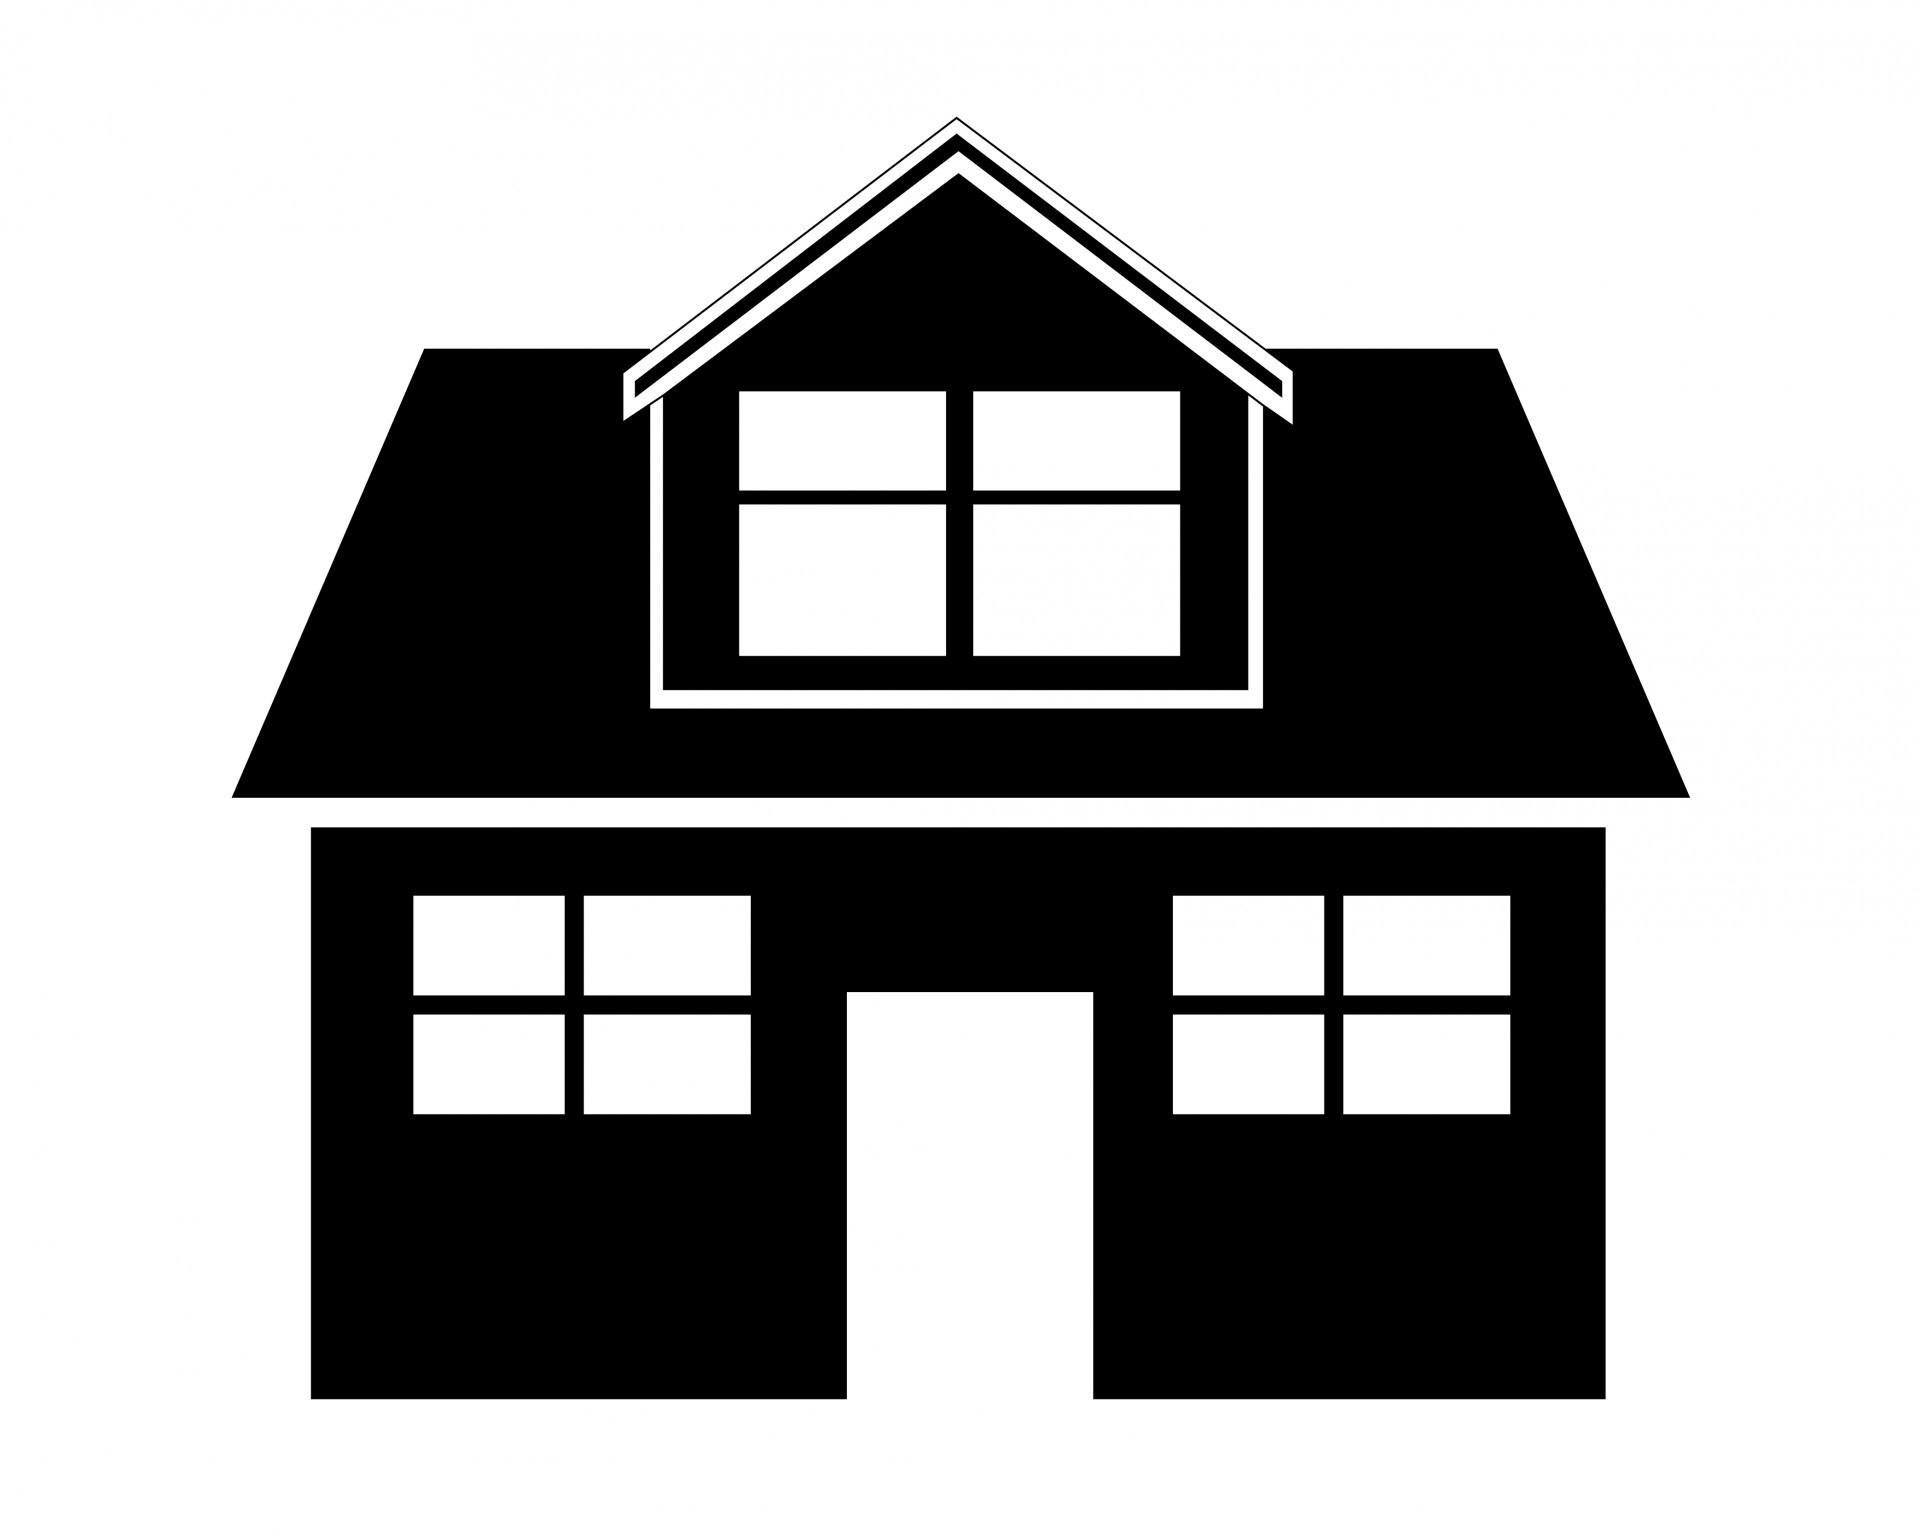 Housing clipart download Housing clipart 5 » Clipart Portal download